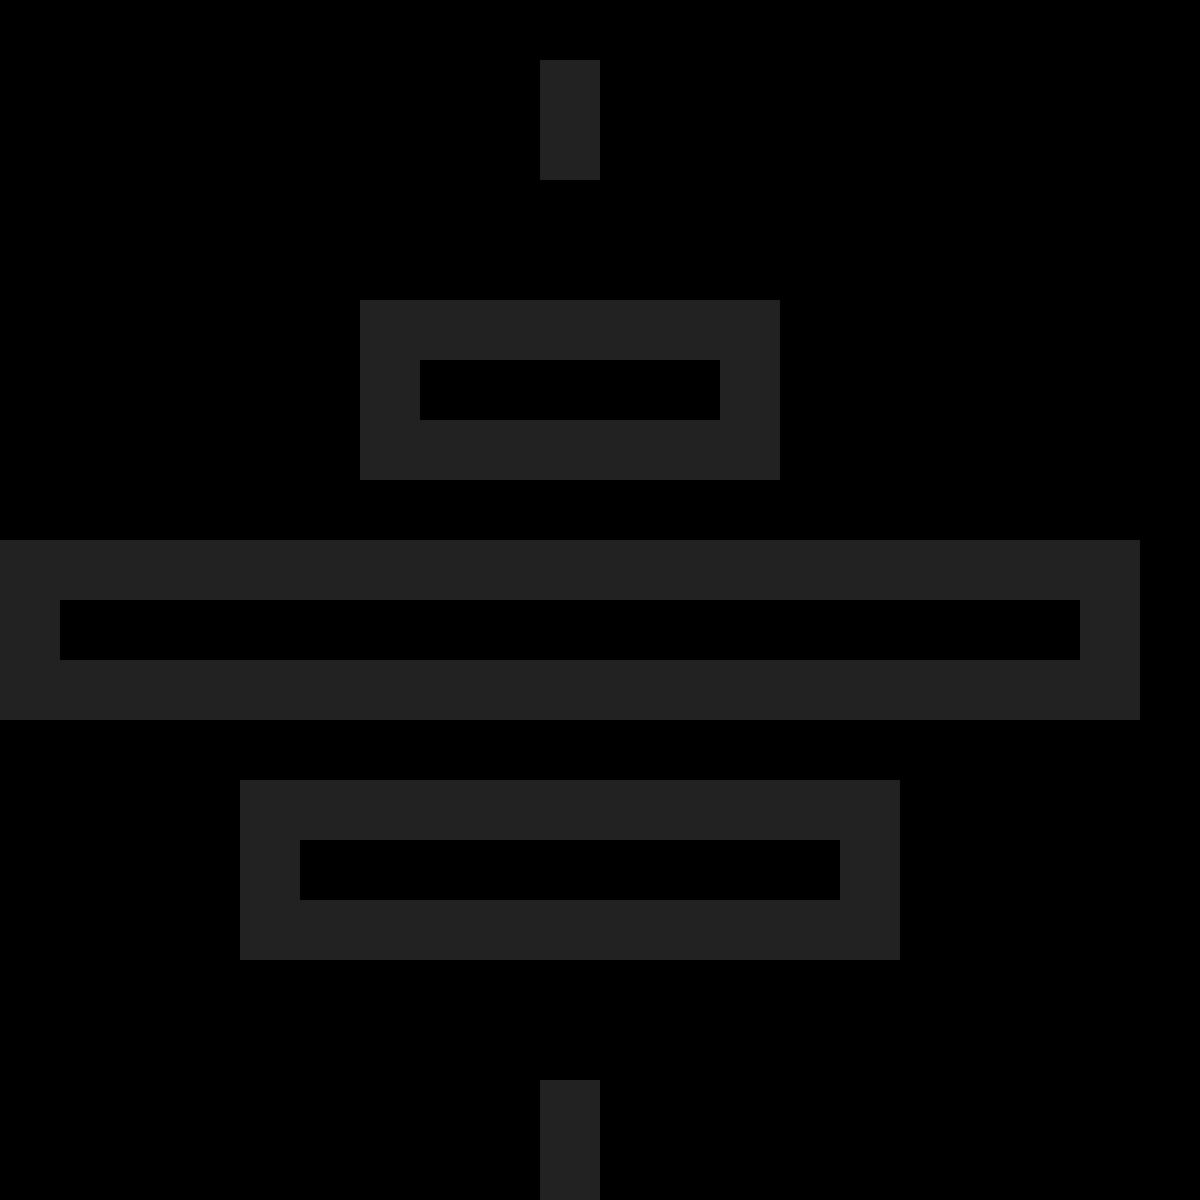 direction  move  interaction  position  center  alignment  align icon icon